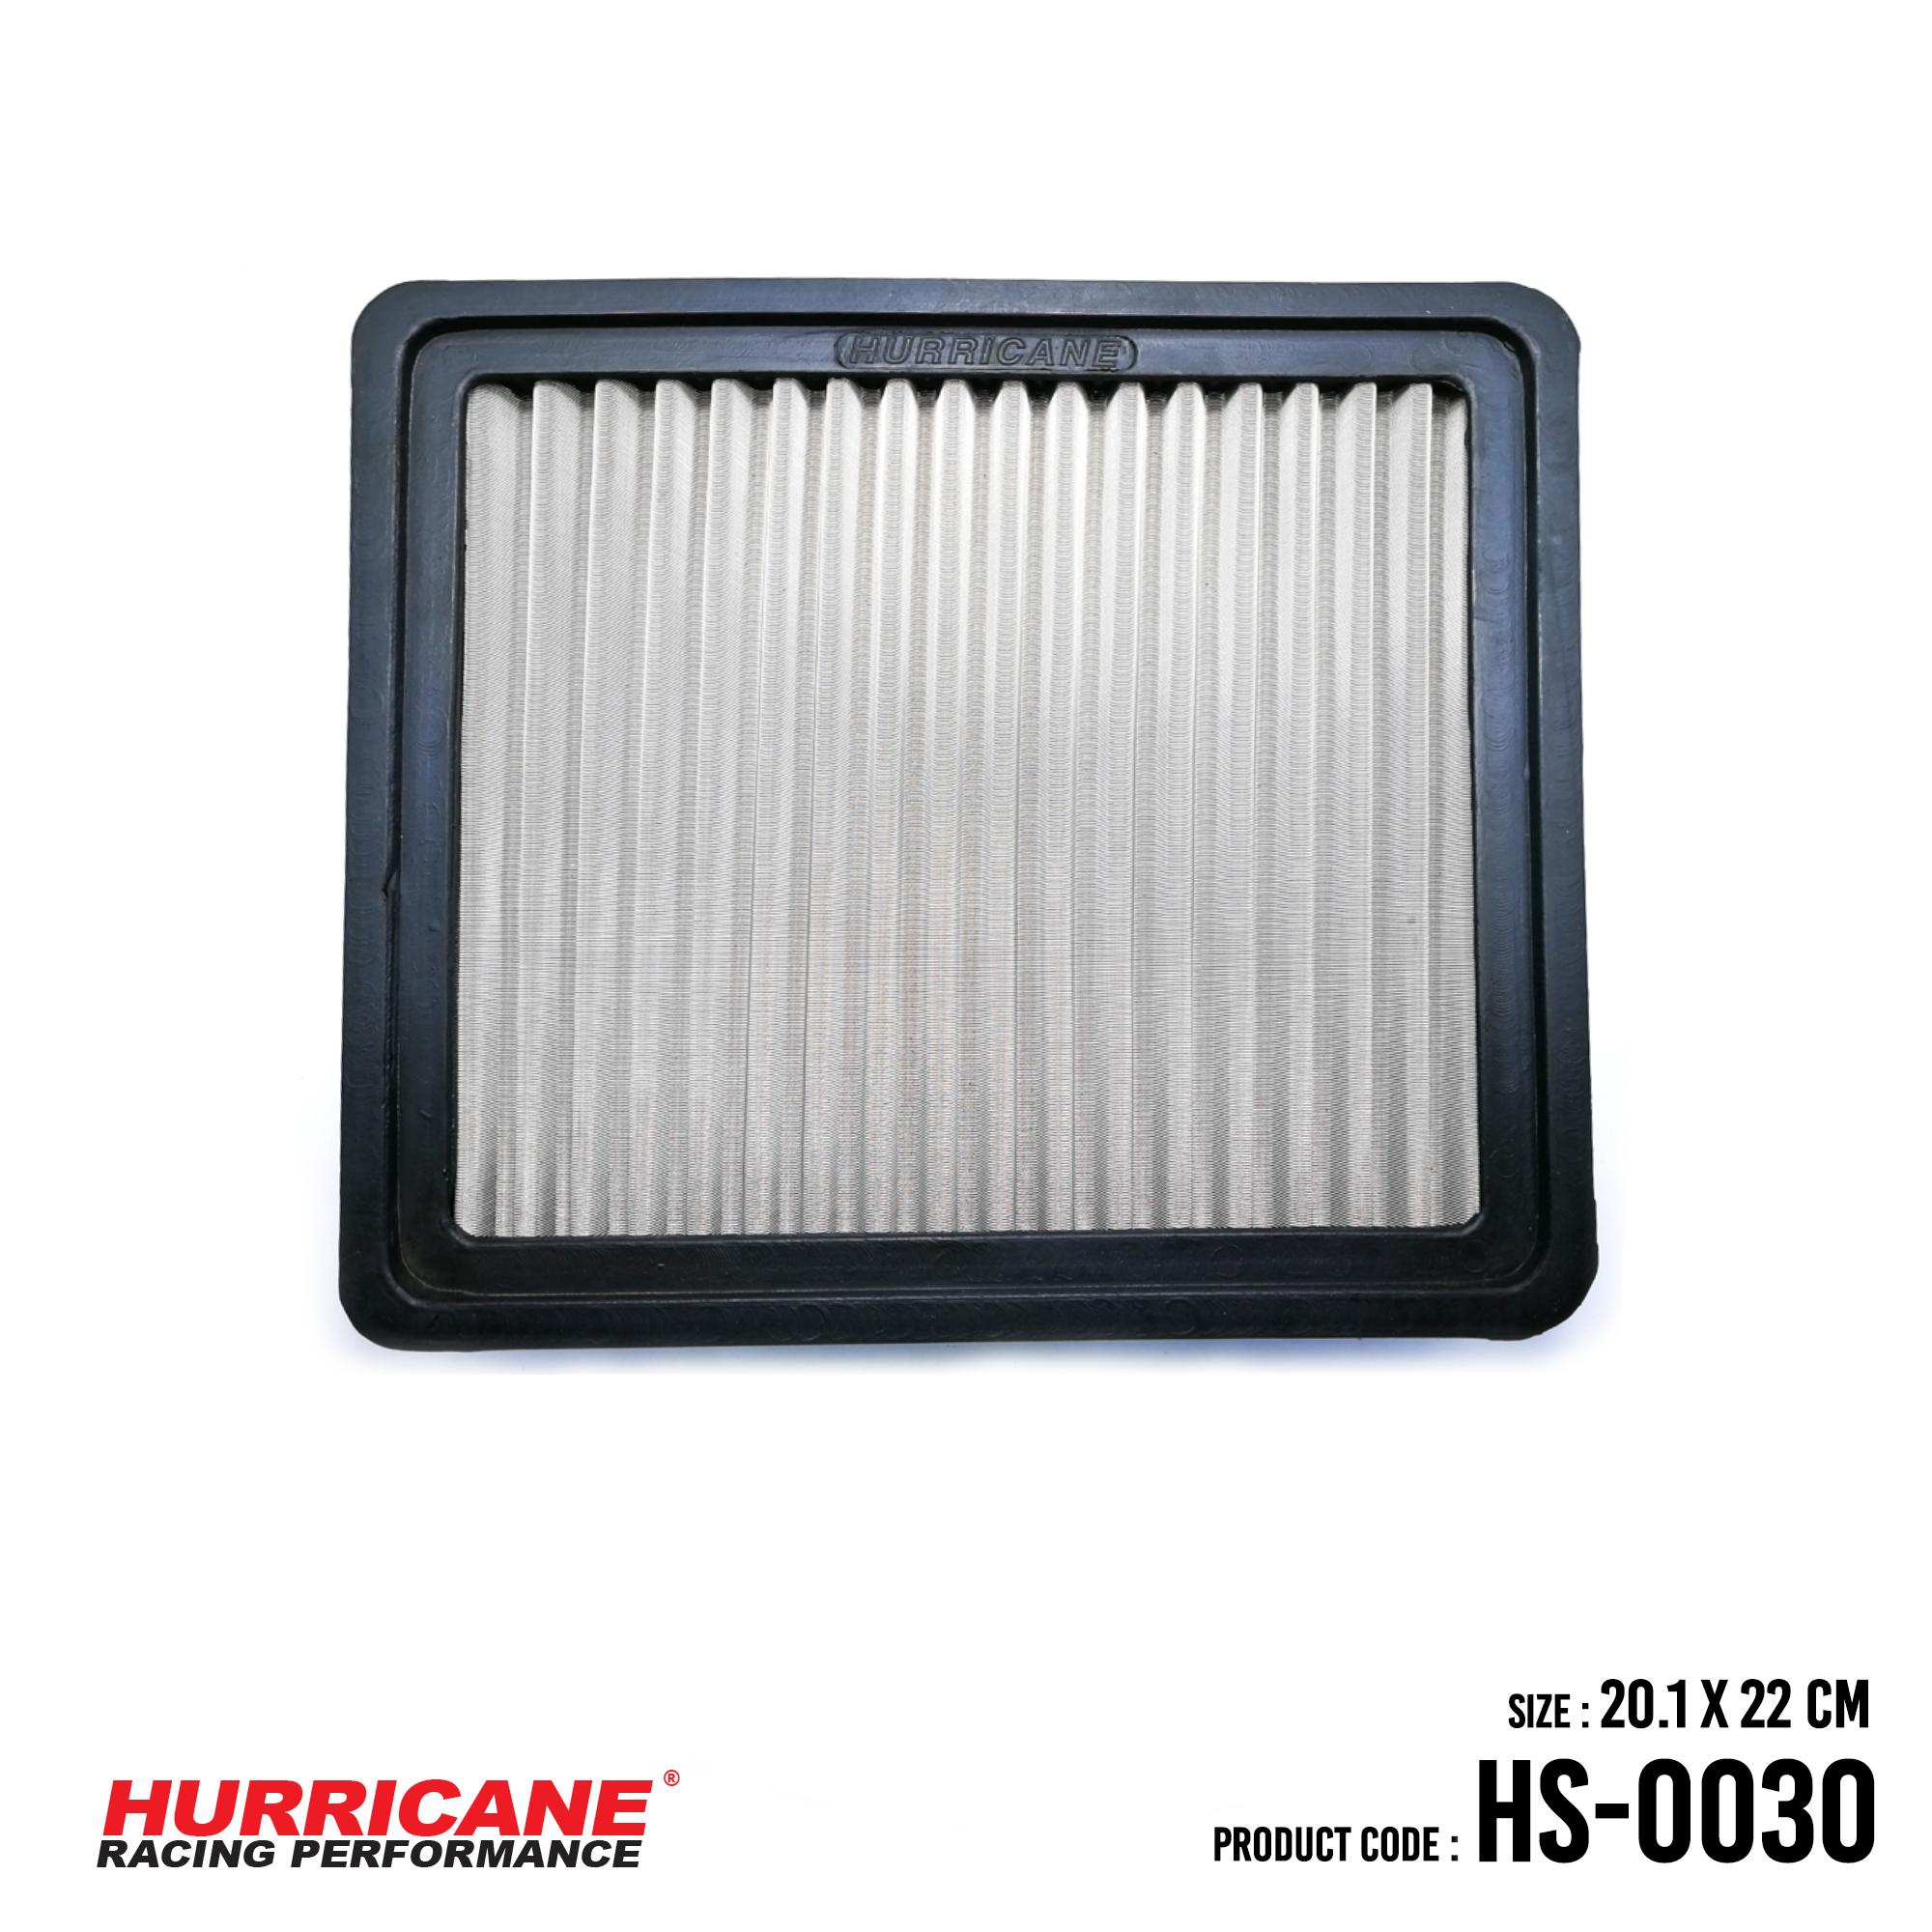 HURRICANE STAINLESS STEEL AIR FILTER FOR HS-0030 DodgeEagleMitsubishiMitsubishiPlymouthProton